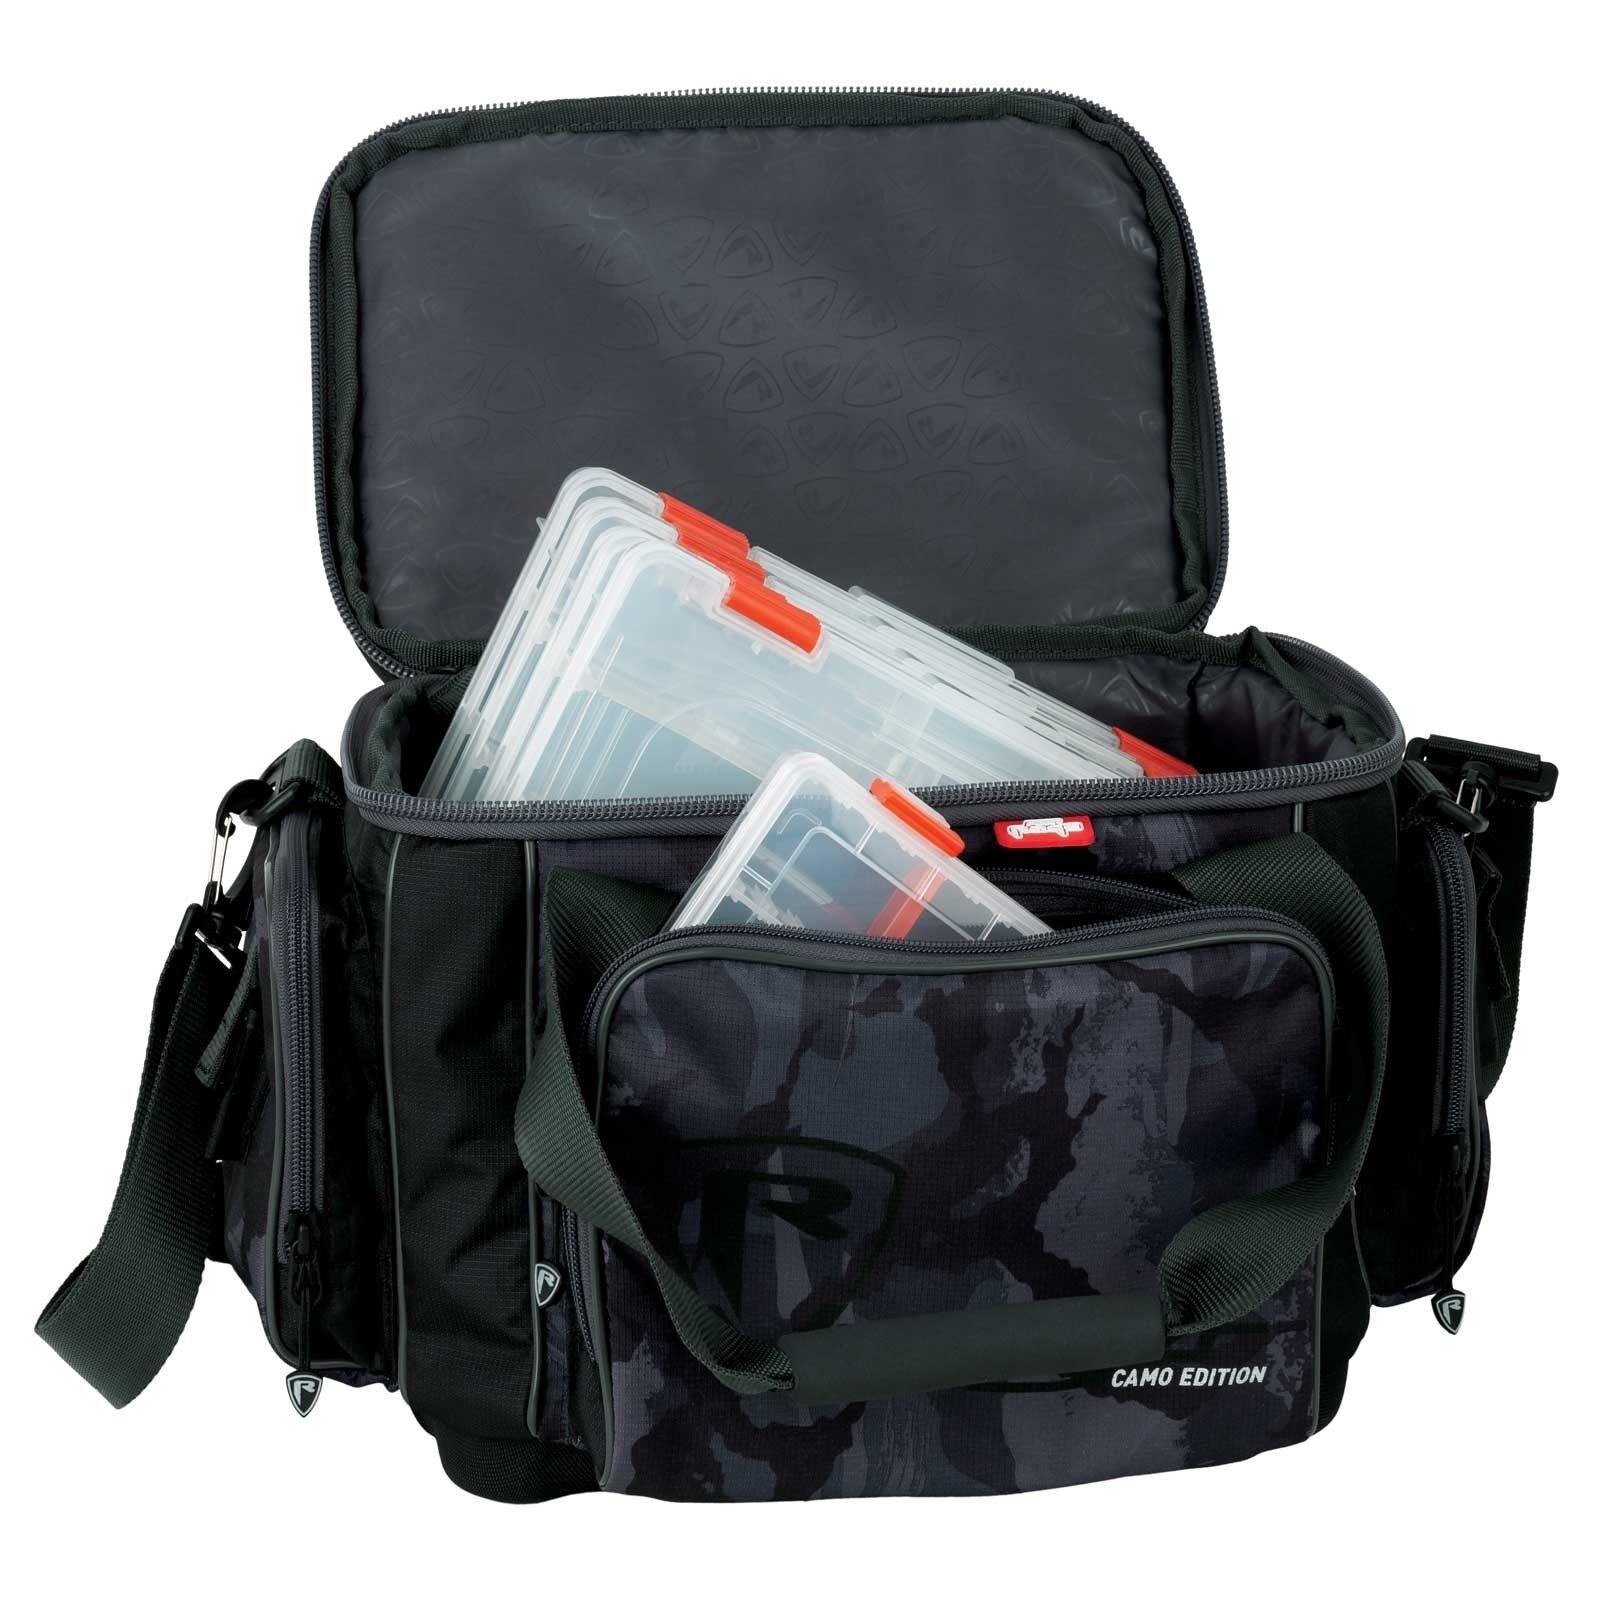 Fox Rage Angeln Angeltasche - Voyager Carrybag Camo Medium Carrybag Voyager Ripstop cf3e49